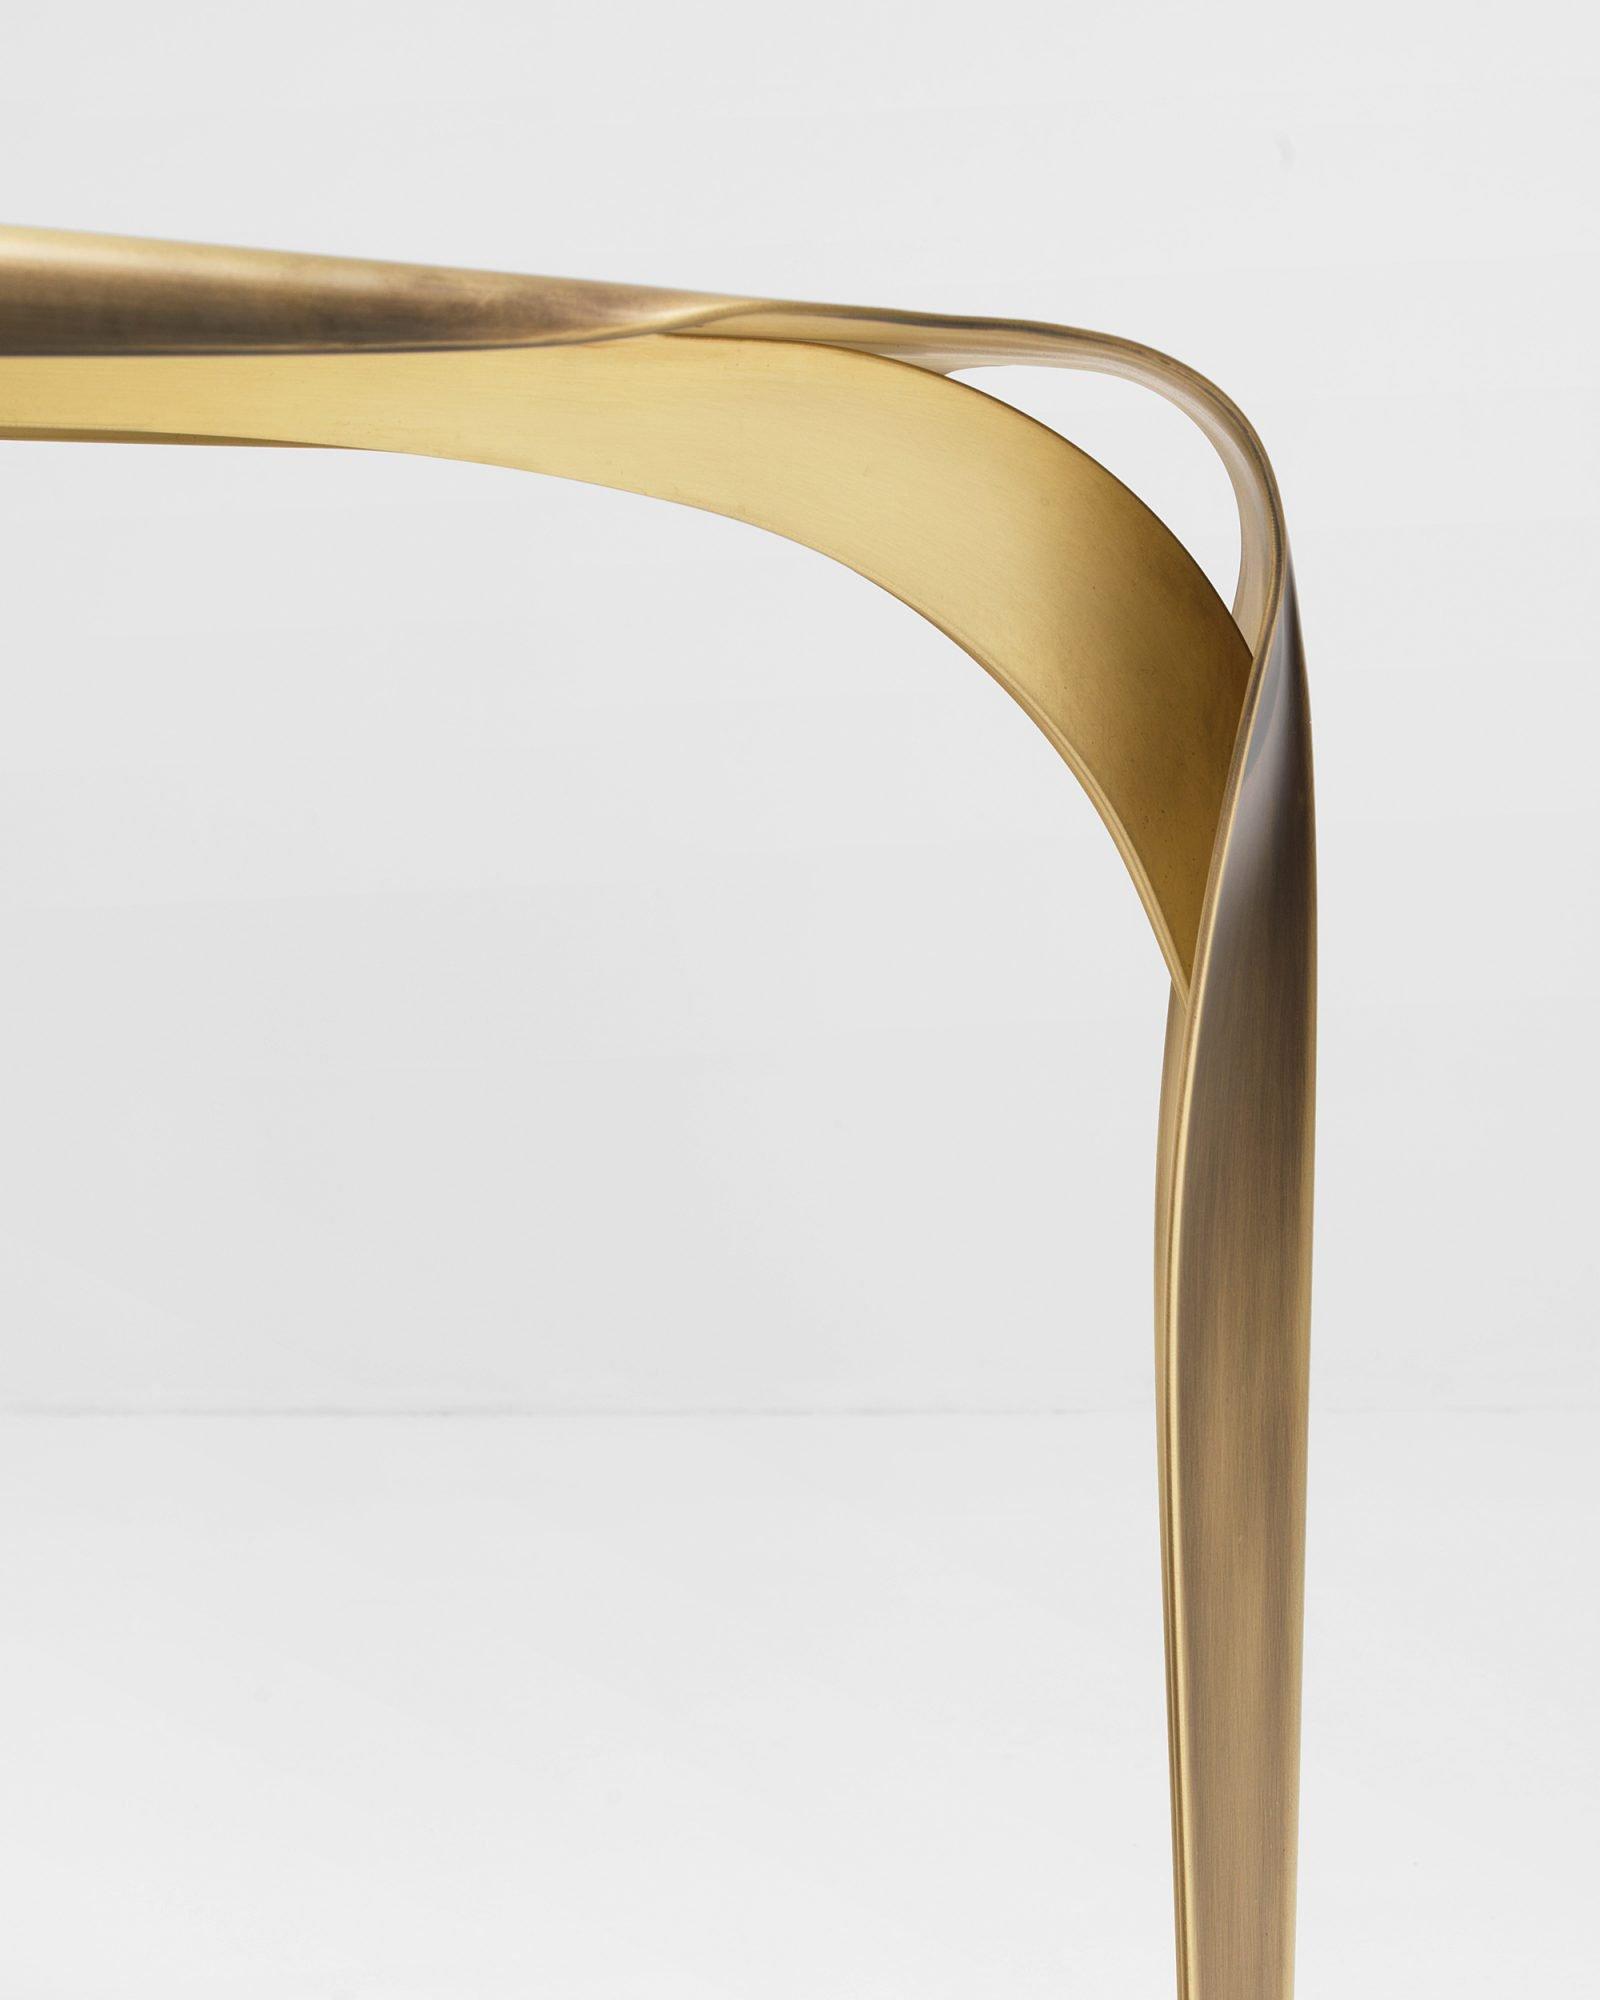 Convivium Table dining from De Castelli, designed by Nikita Bettoni